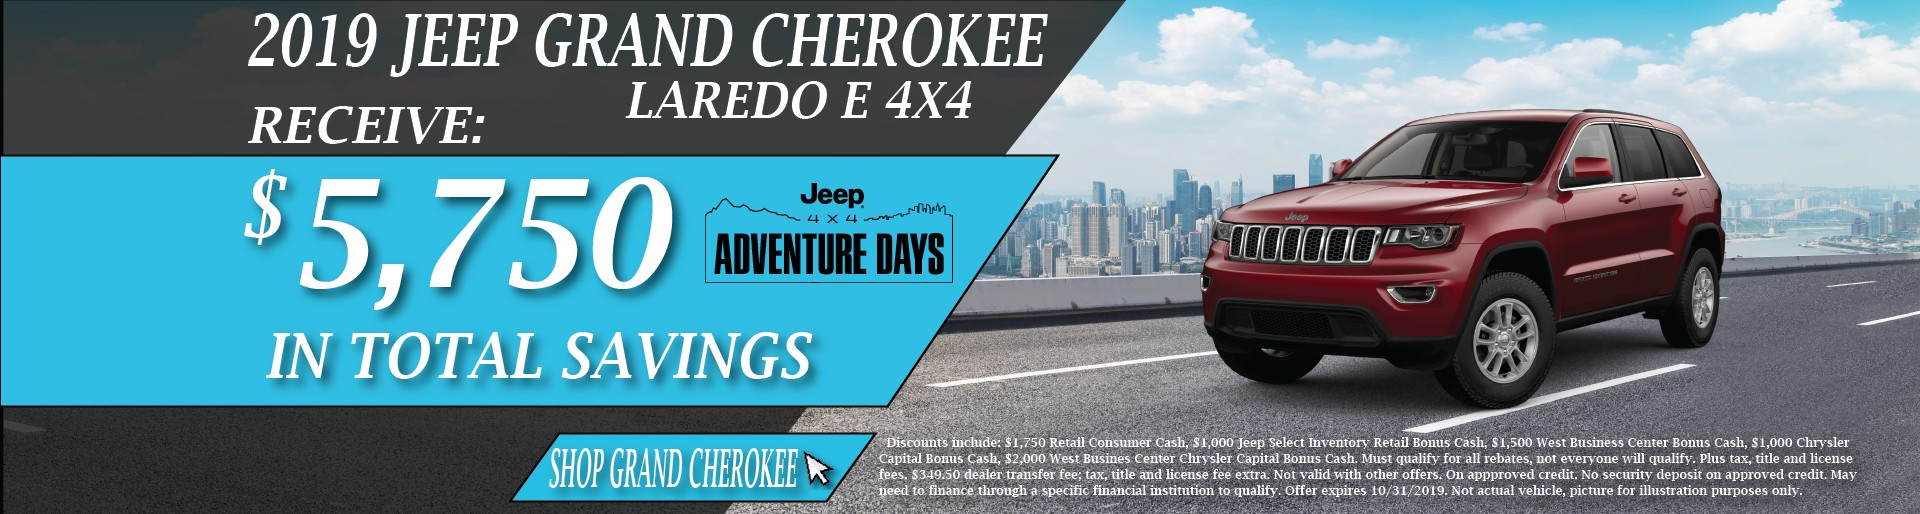 2019 Jeep Grand Cherokee October